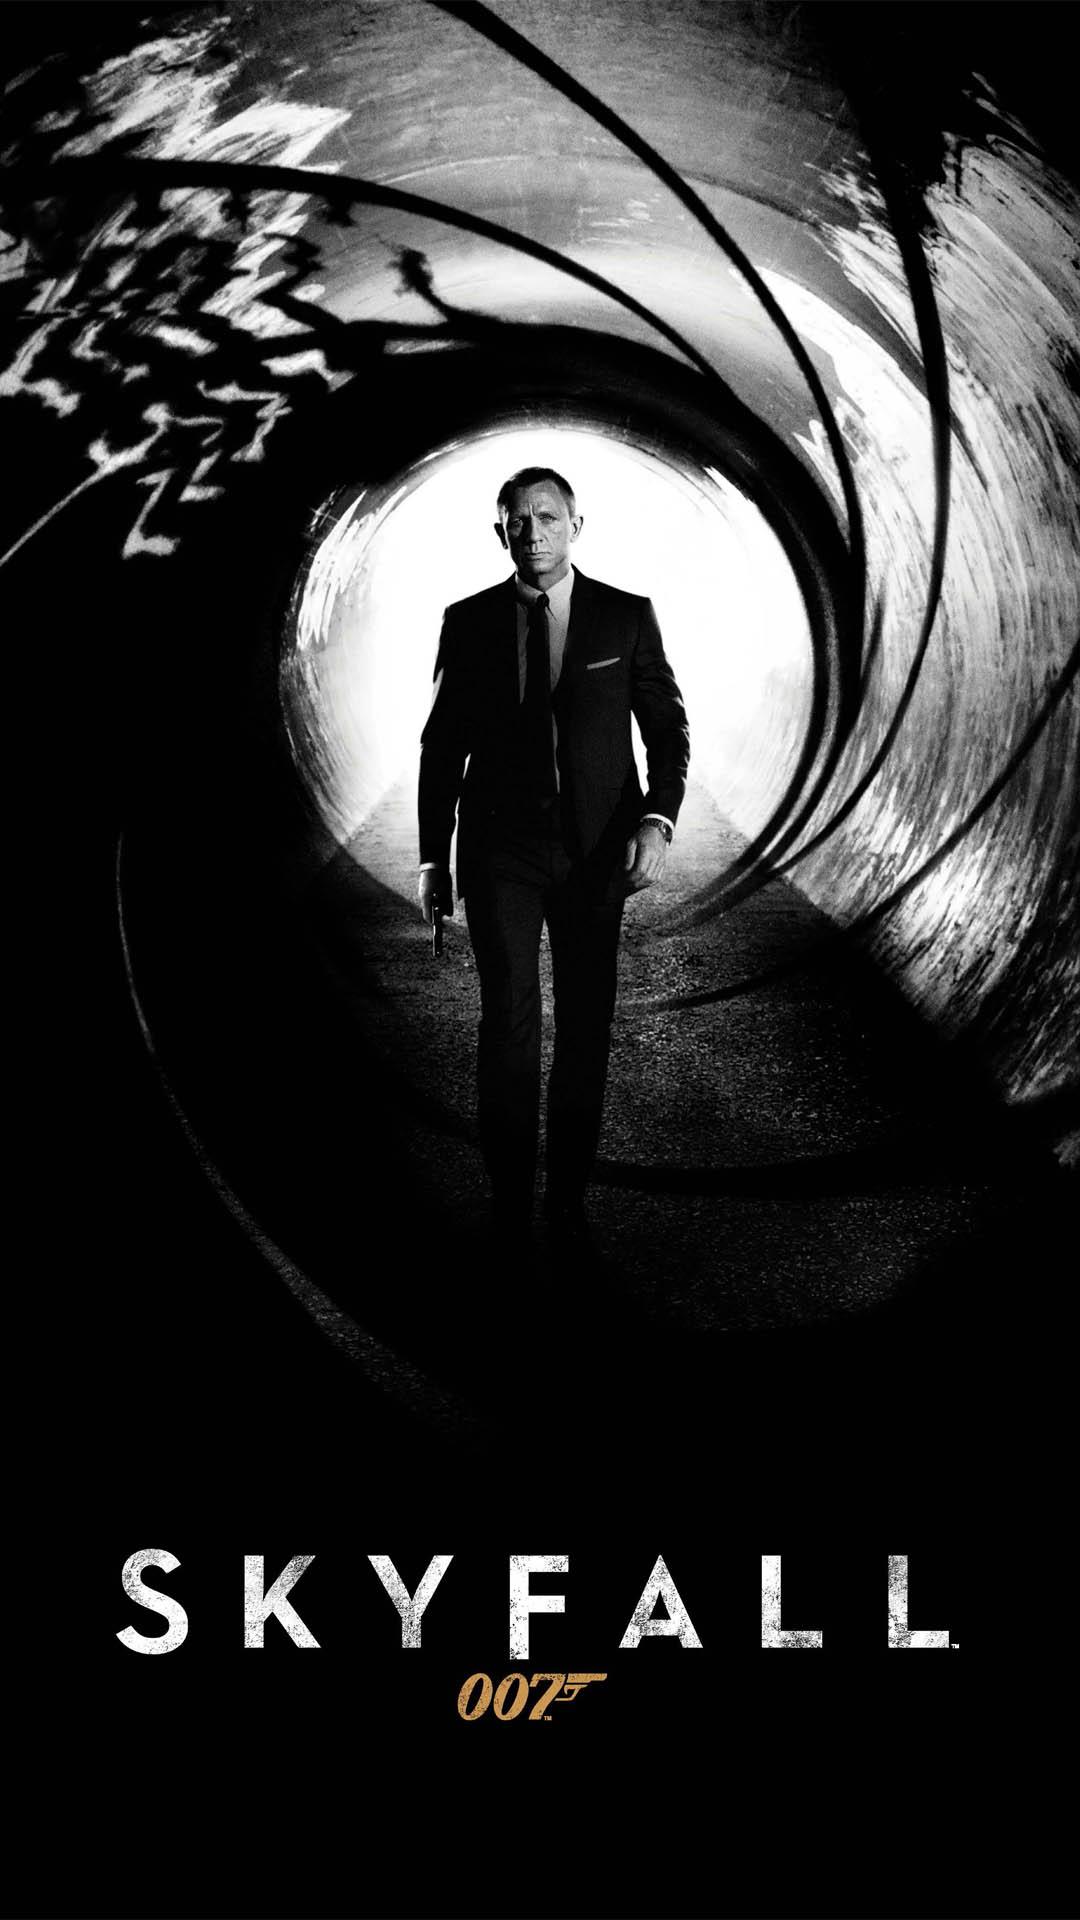 Skyfall 007 James Bond